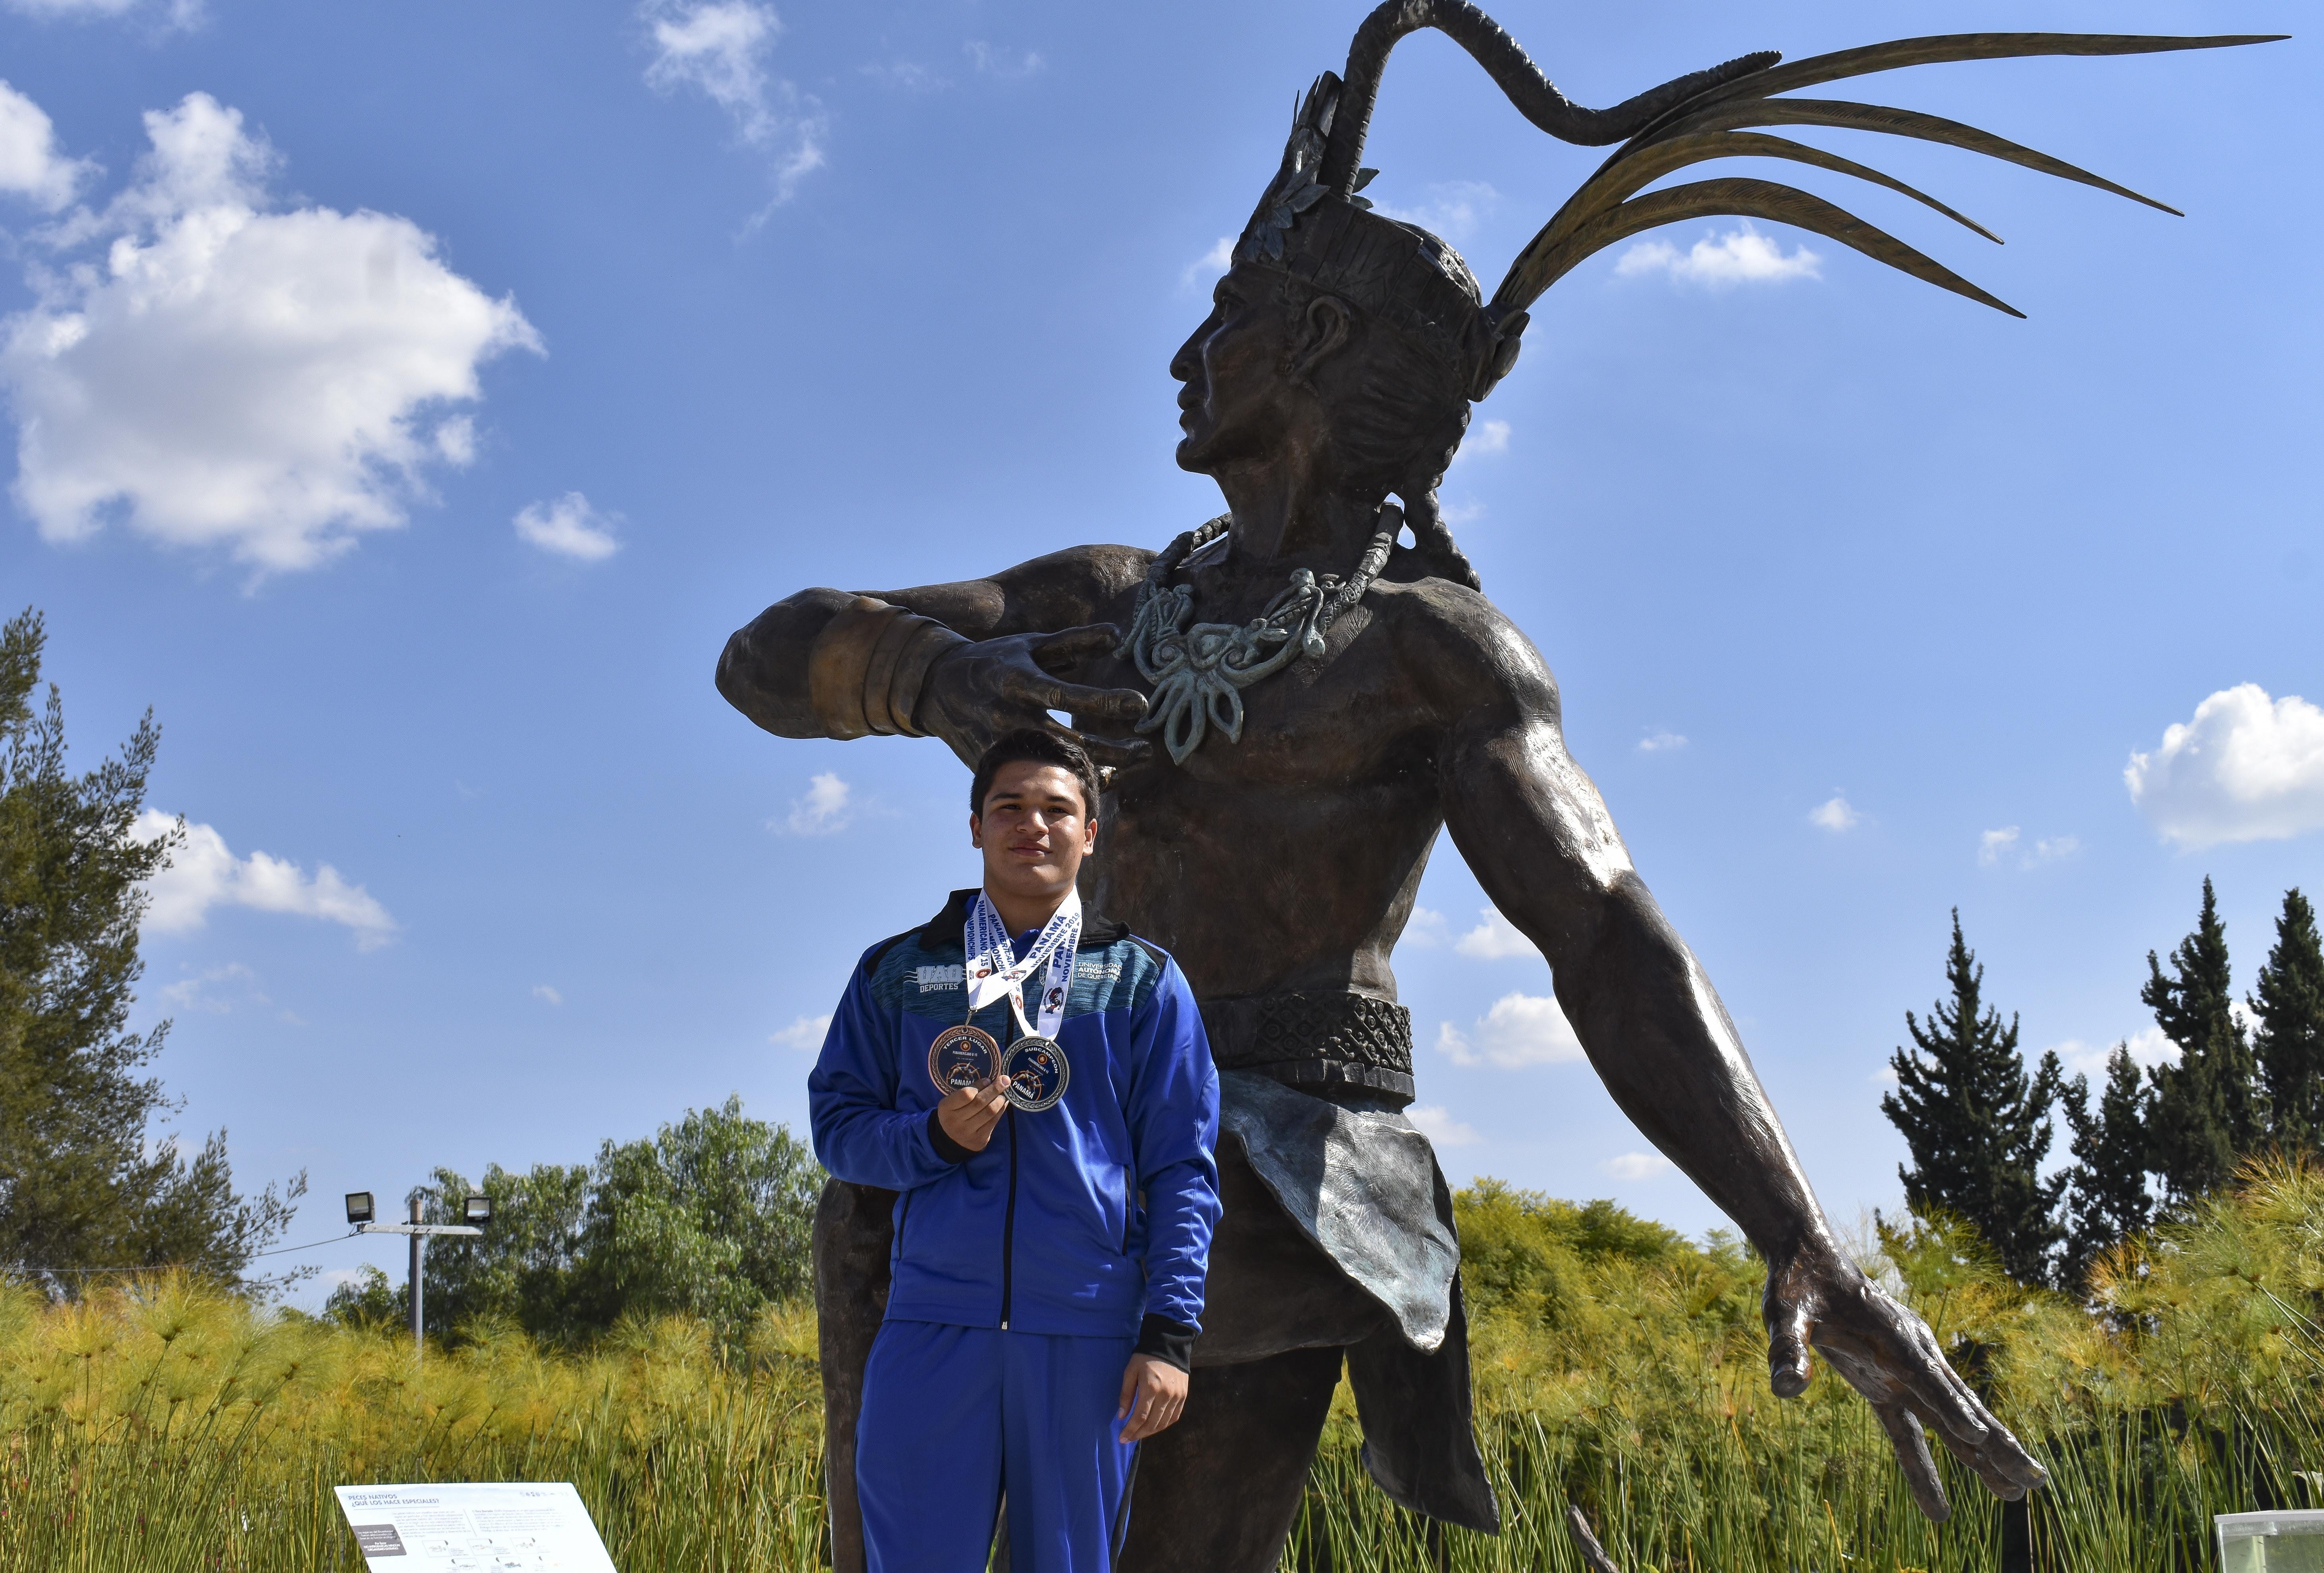 Destaca alumno de Bachilleres Bicentenario en competencia panamericana